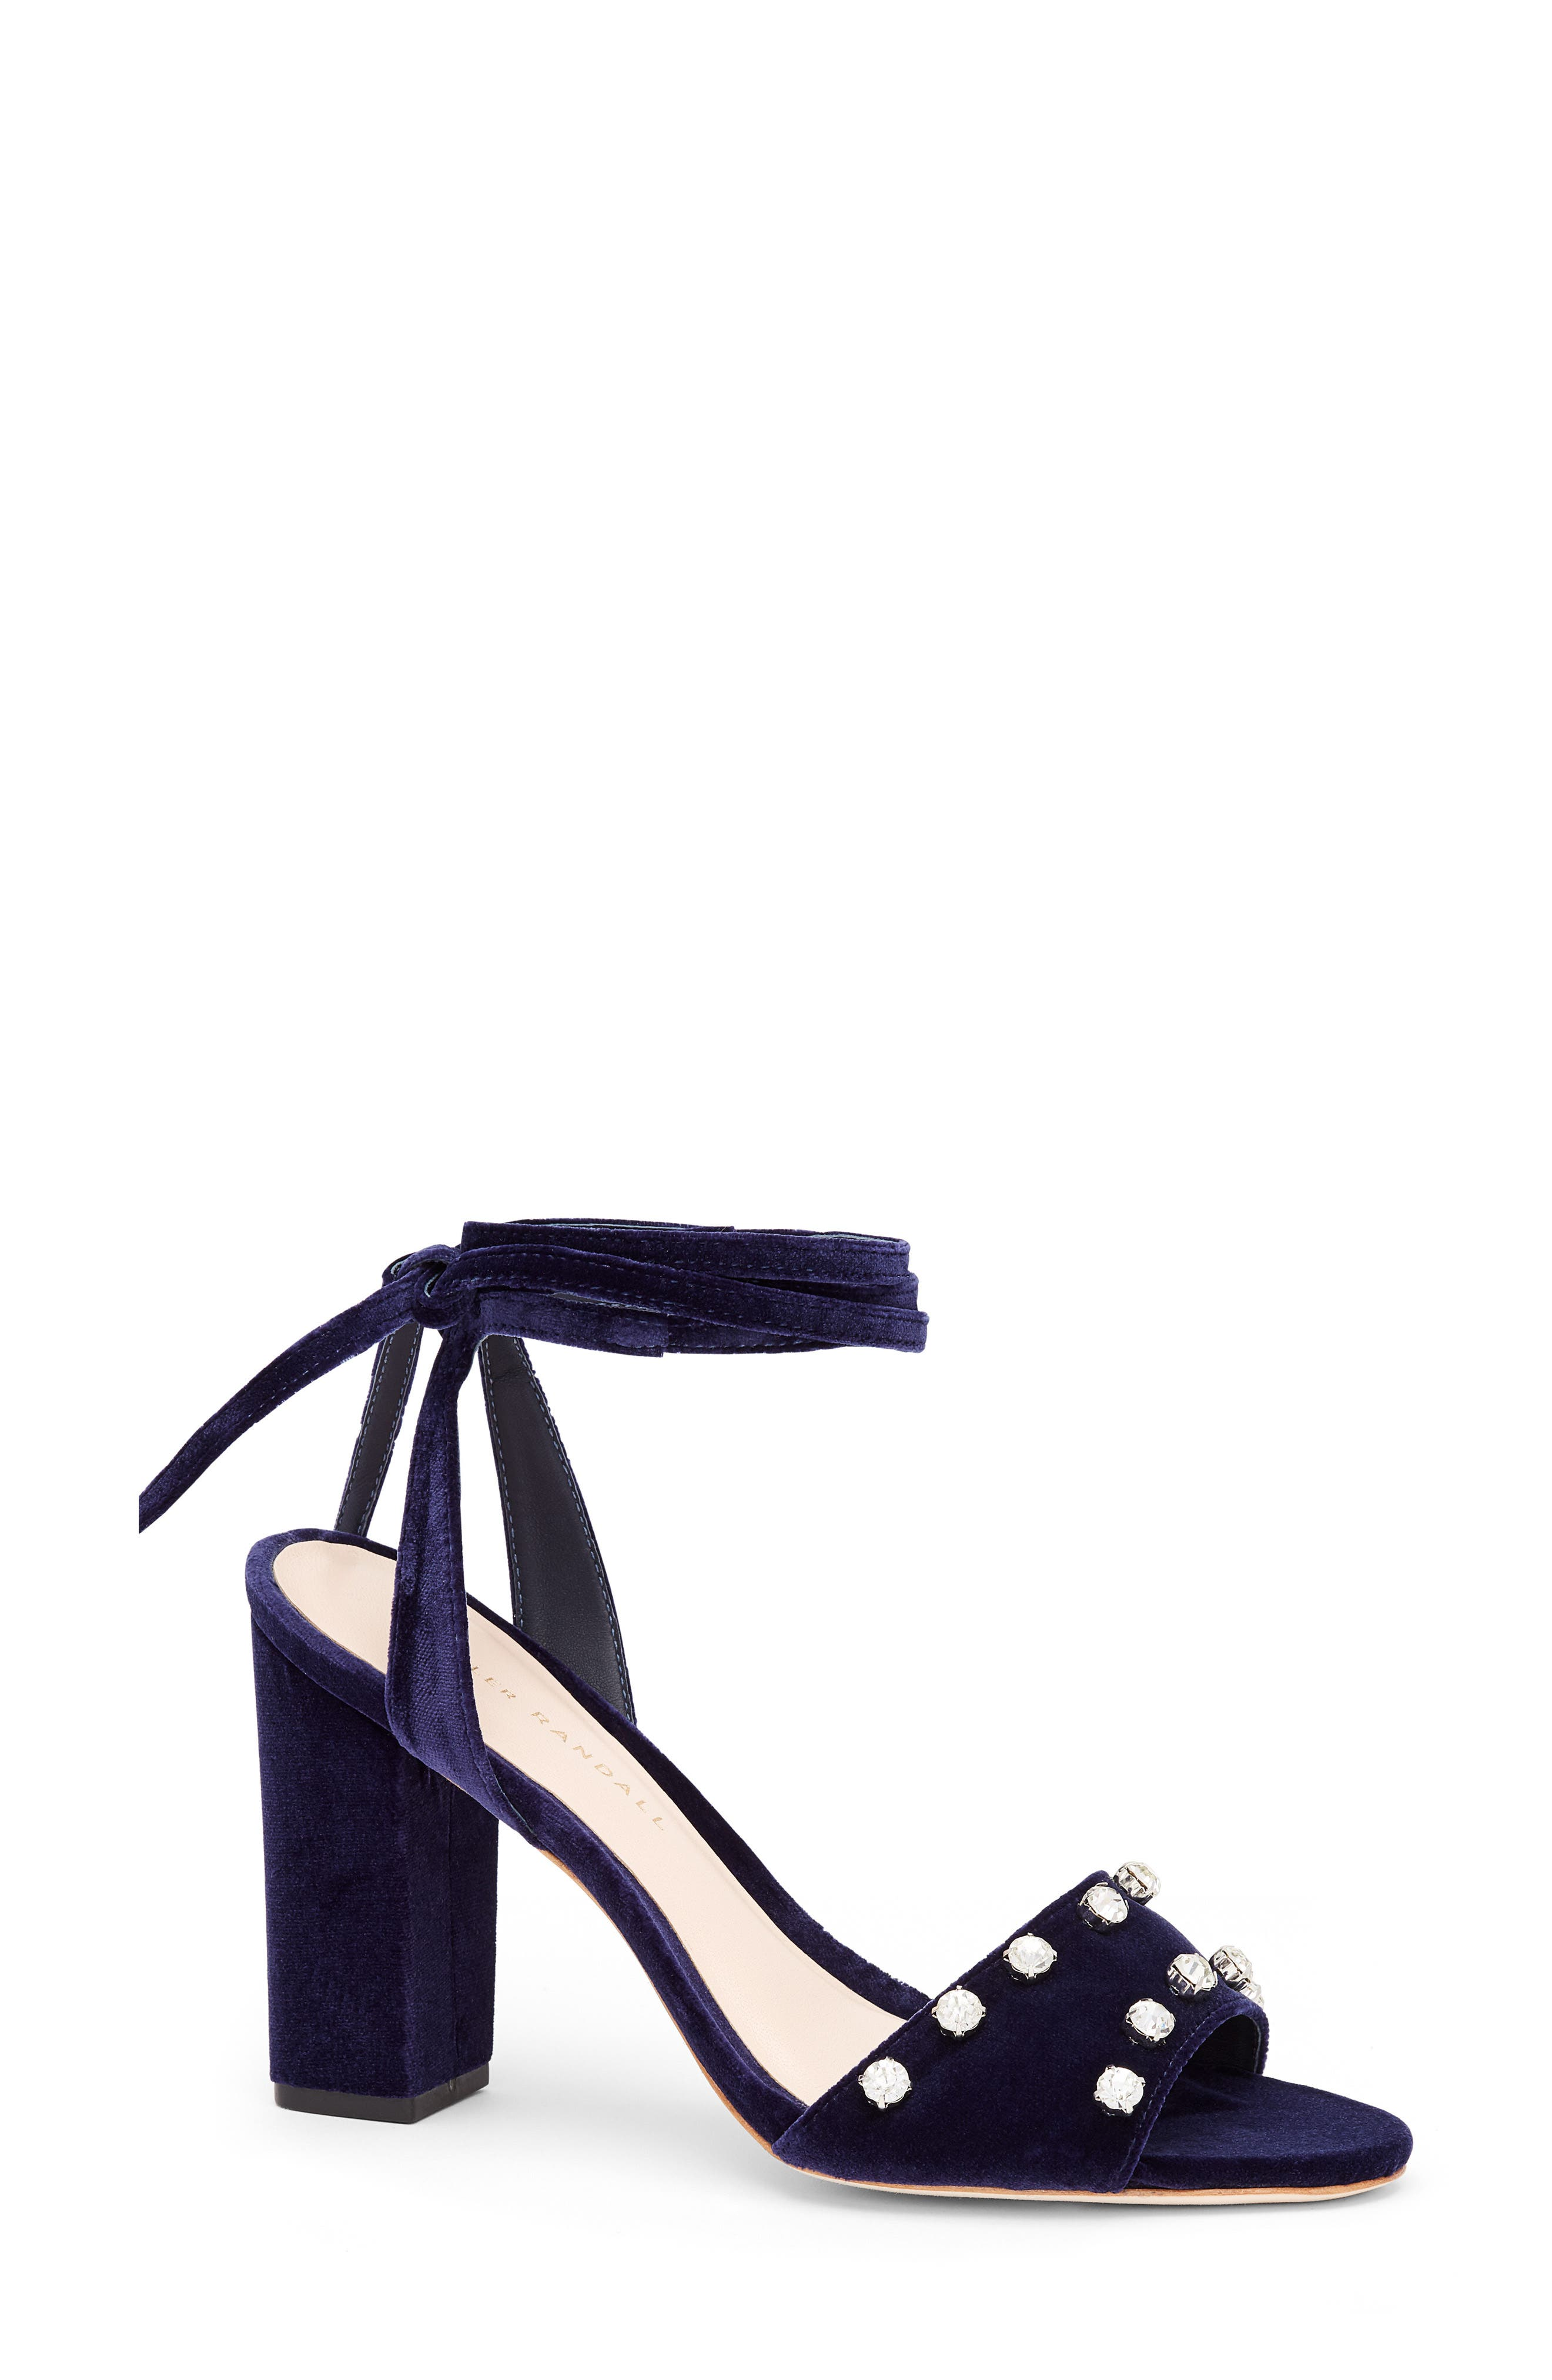 Elayna Ankle Wrap Sandal,                         Main,                         color, 414